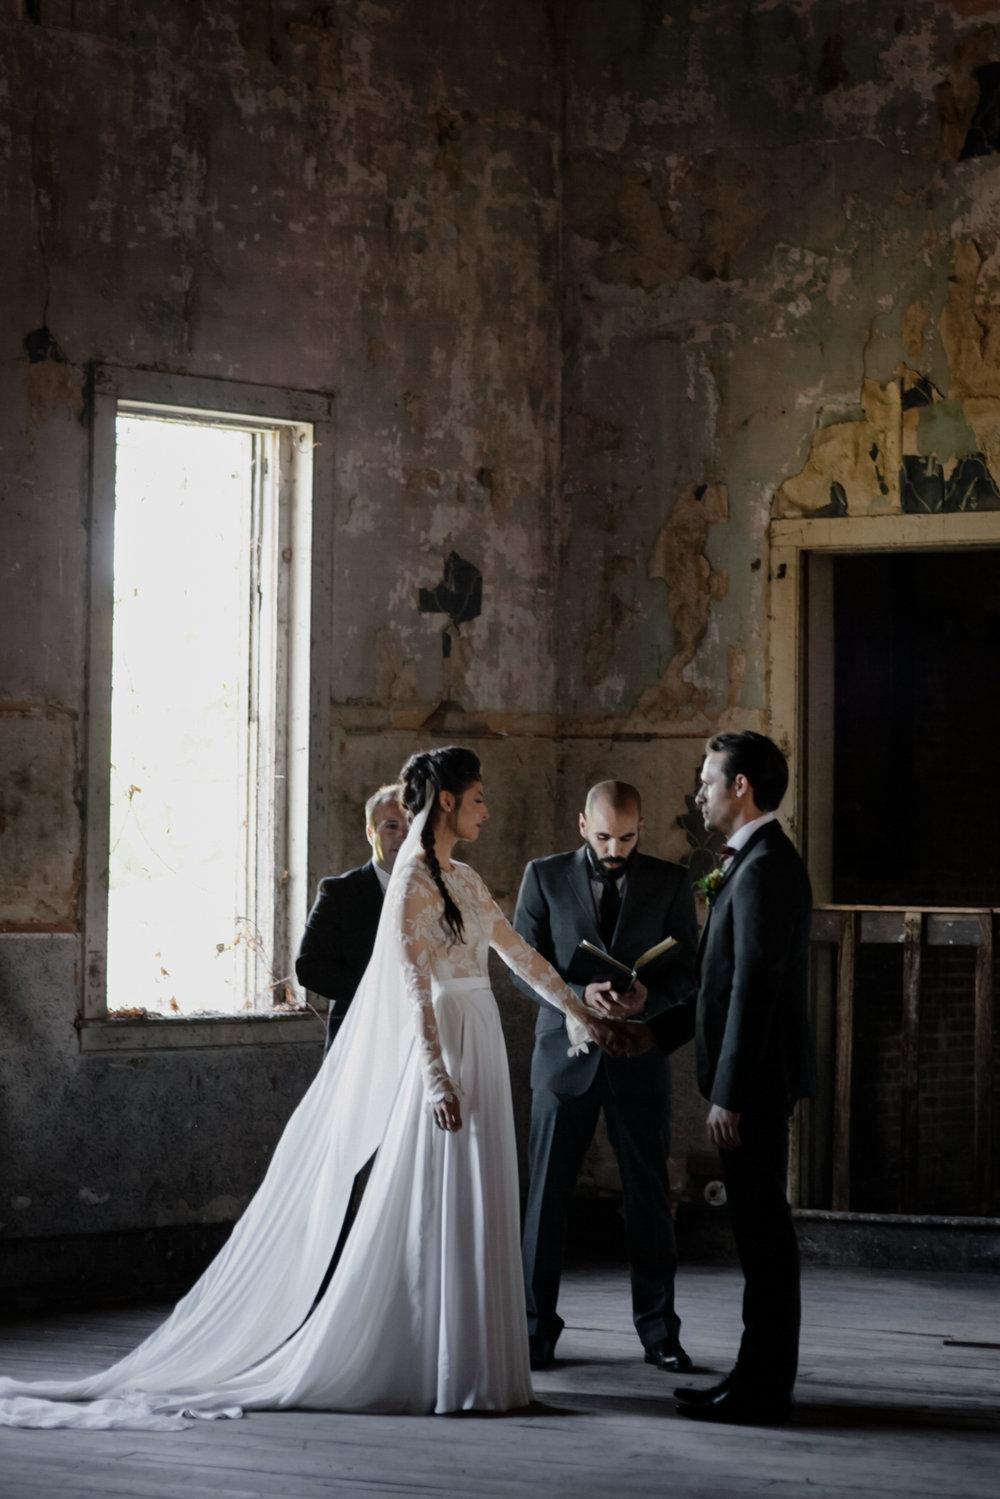 Kimberly-Coccagnia-Wedding-Photographer-90.JPG